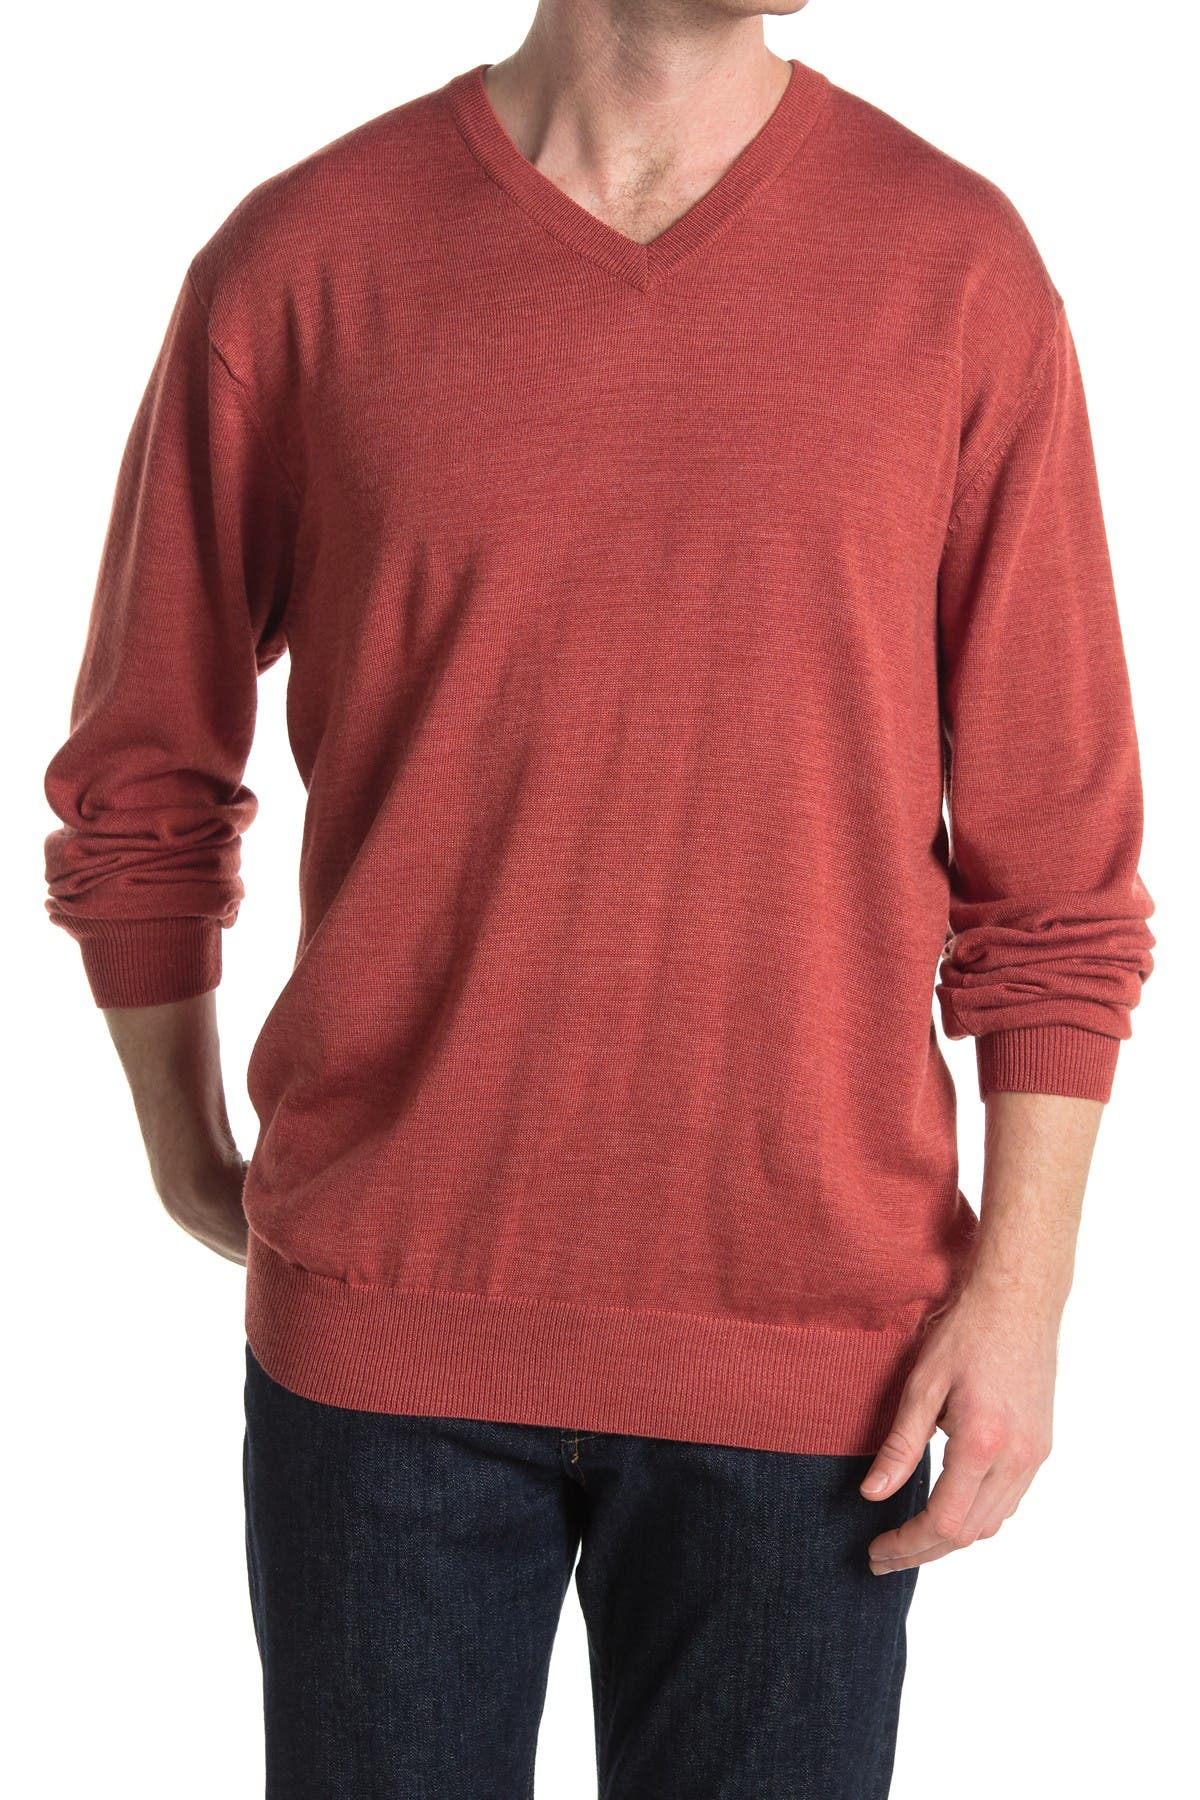 Image of Cutter & Buck Douglas V-Neck Sweater